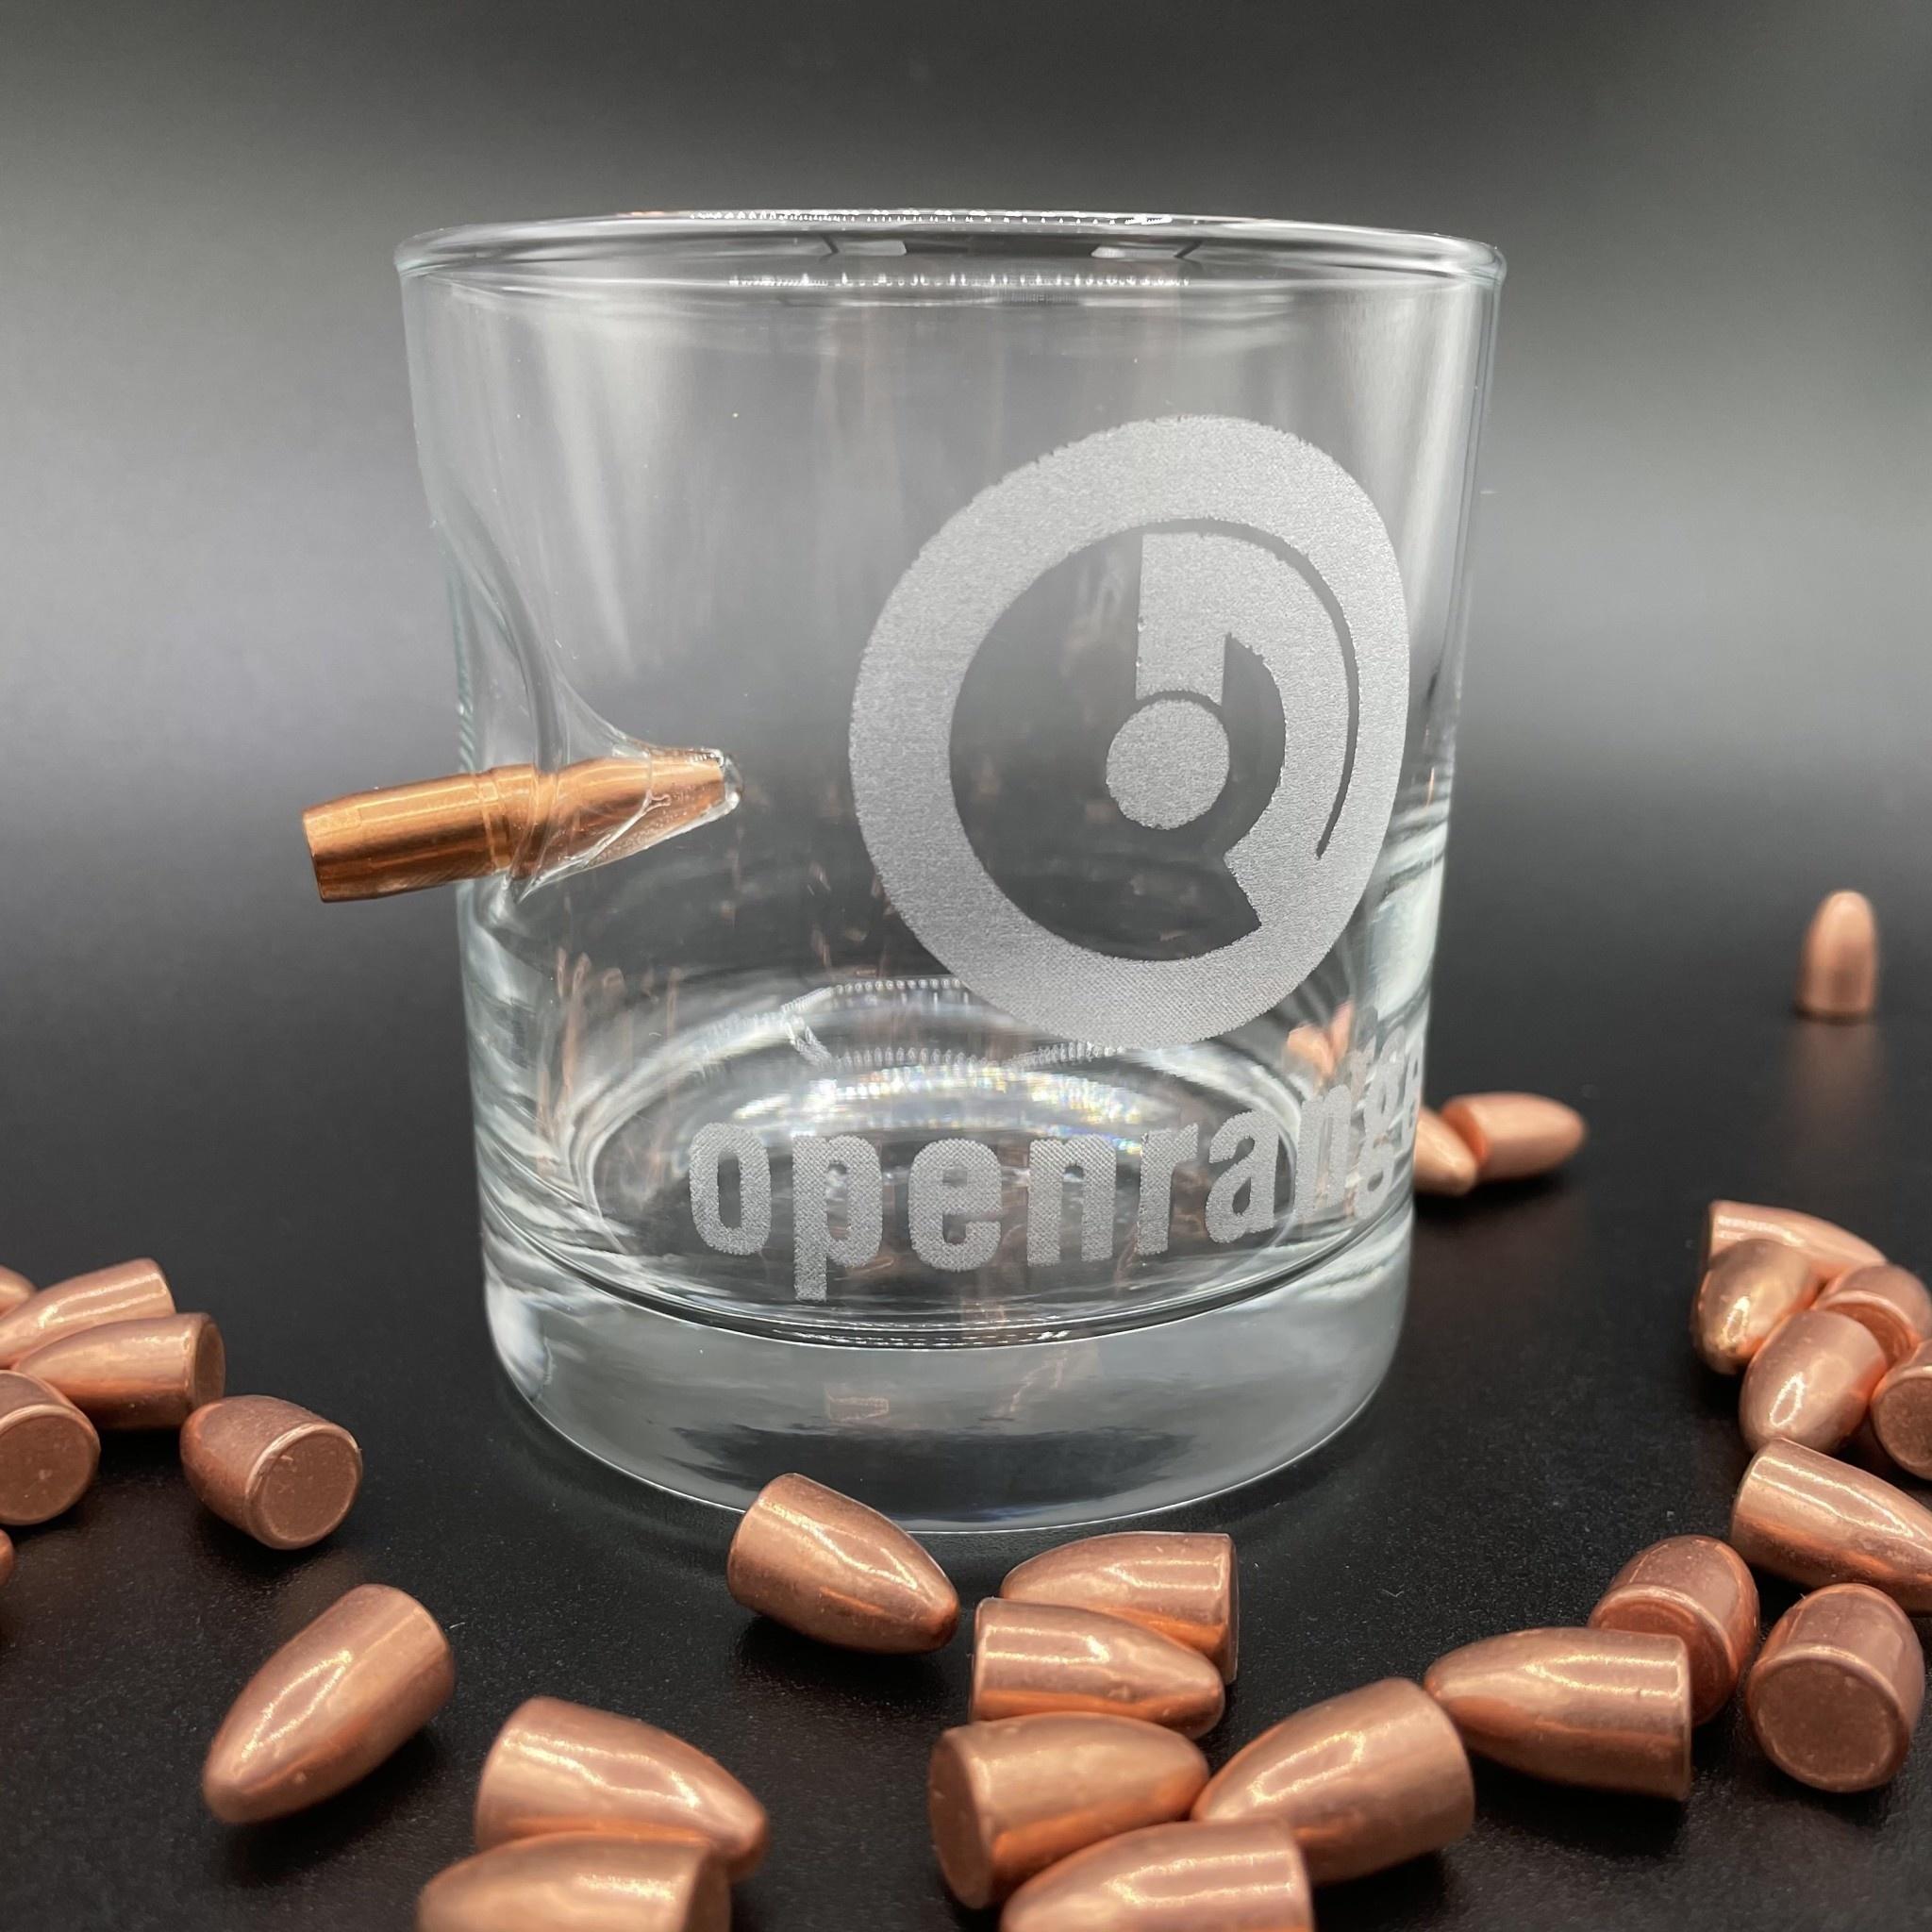 Openrange Whiskey Glass - .308 - American Made by BenShot